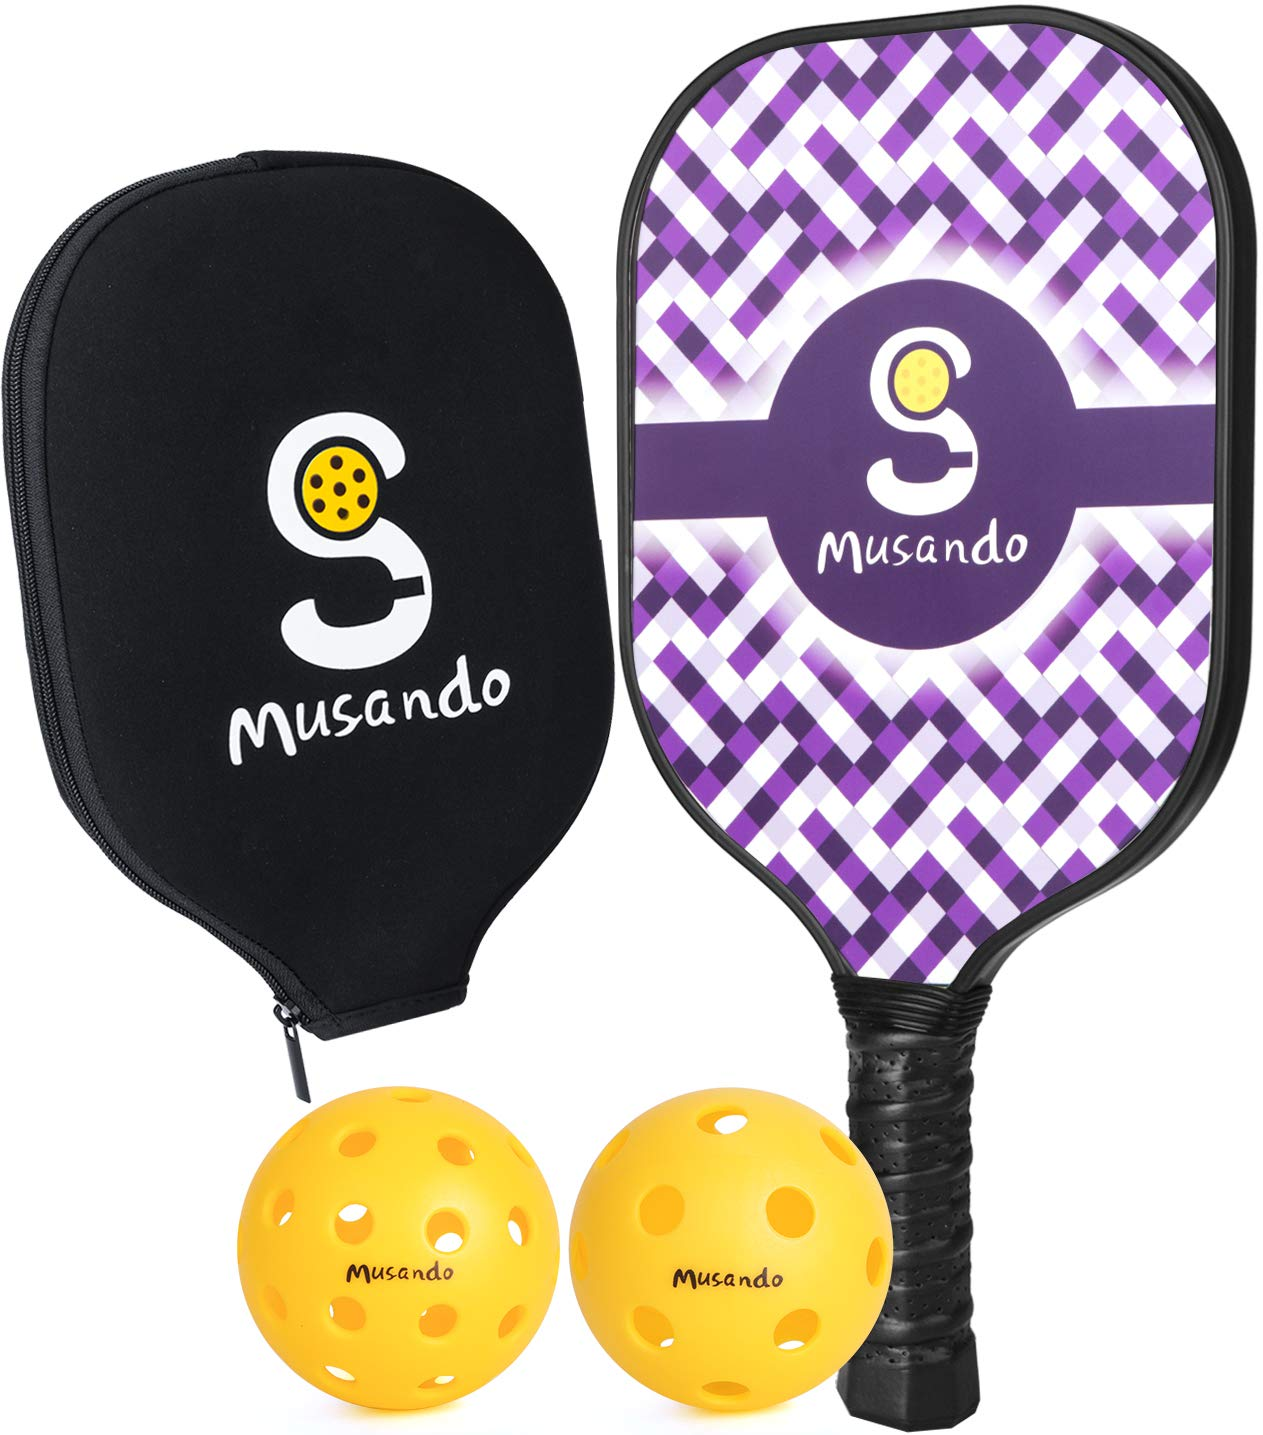 Musando Pickleball Paddle - USAPA Approved Graphite Lightwei